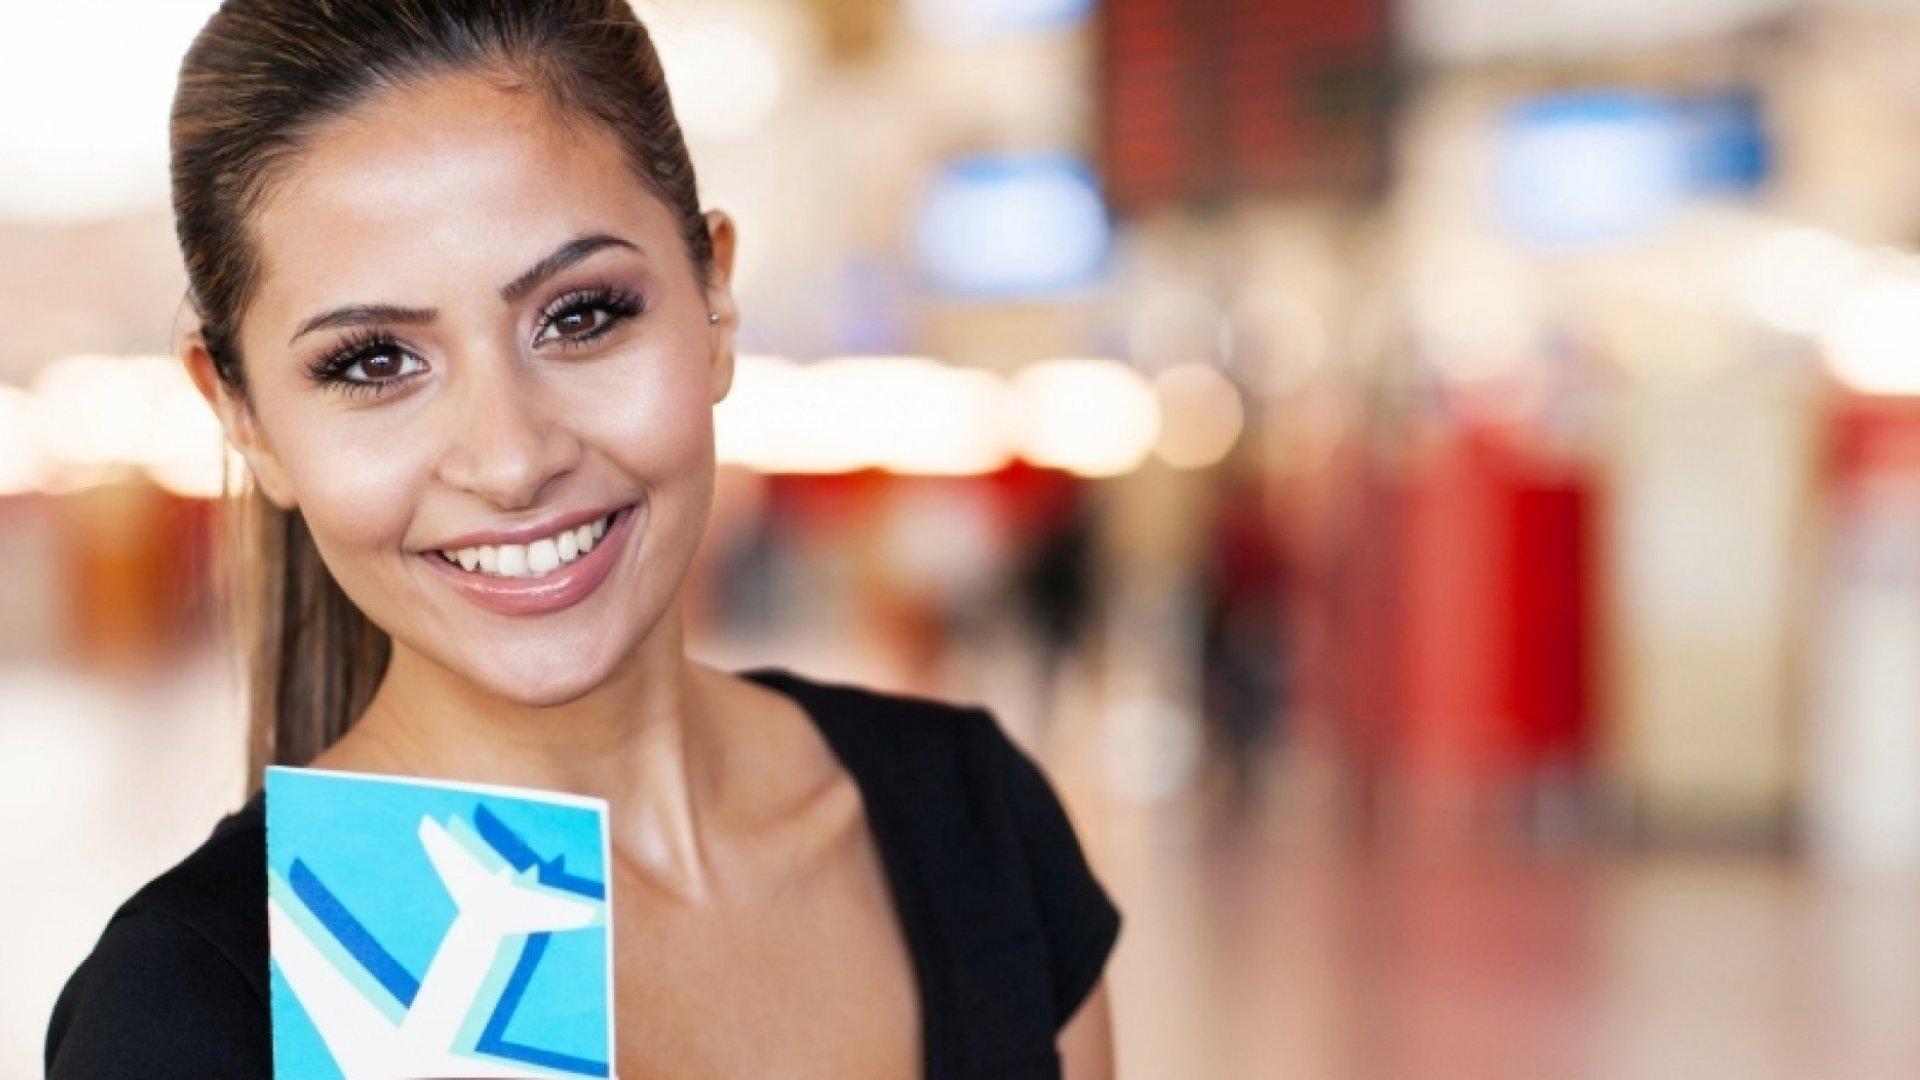 7 Surprising Tricks for Savvy Business Travelers